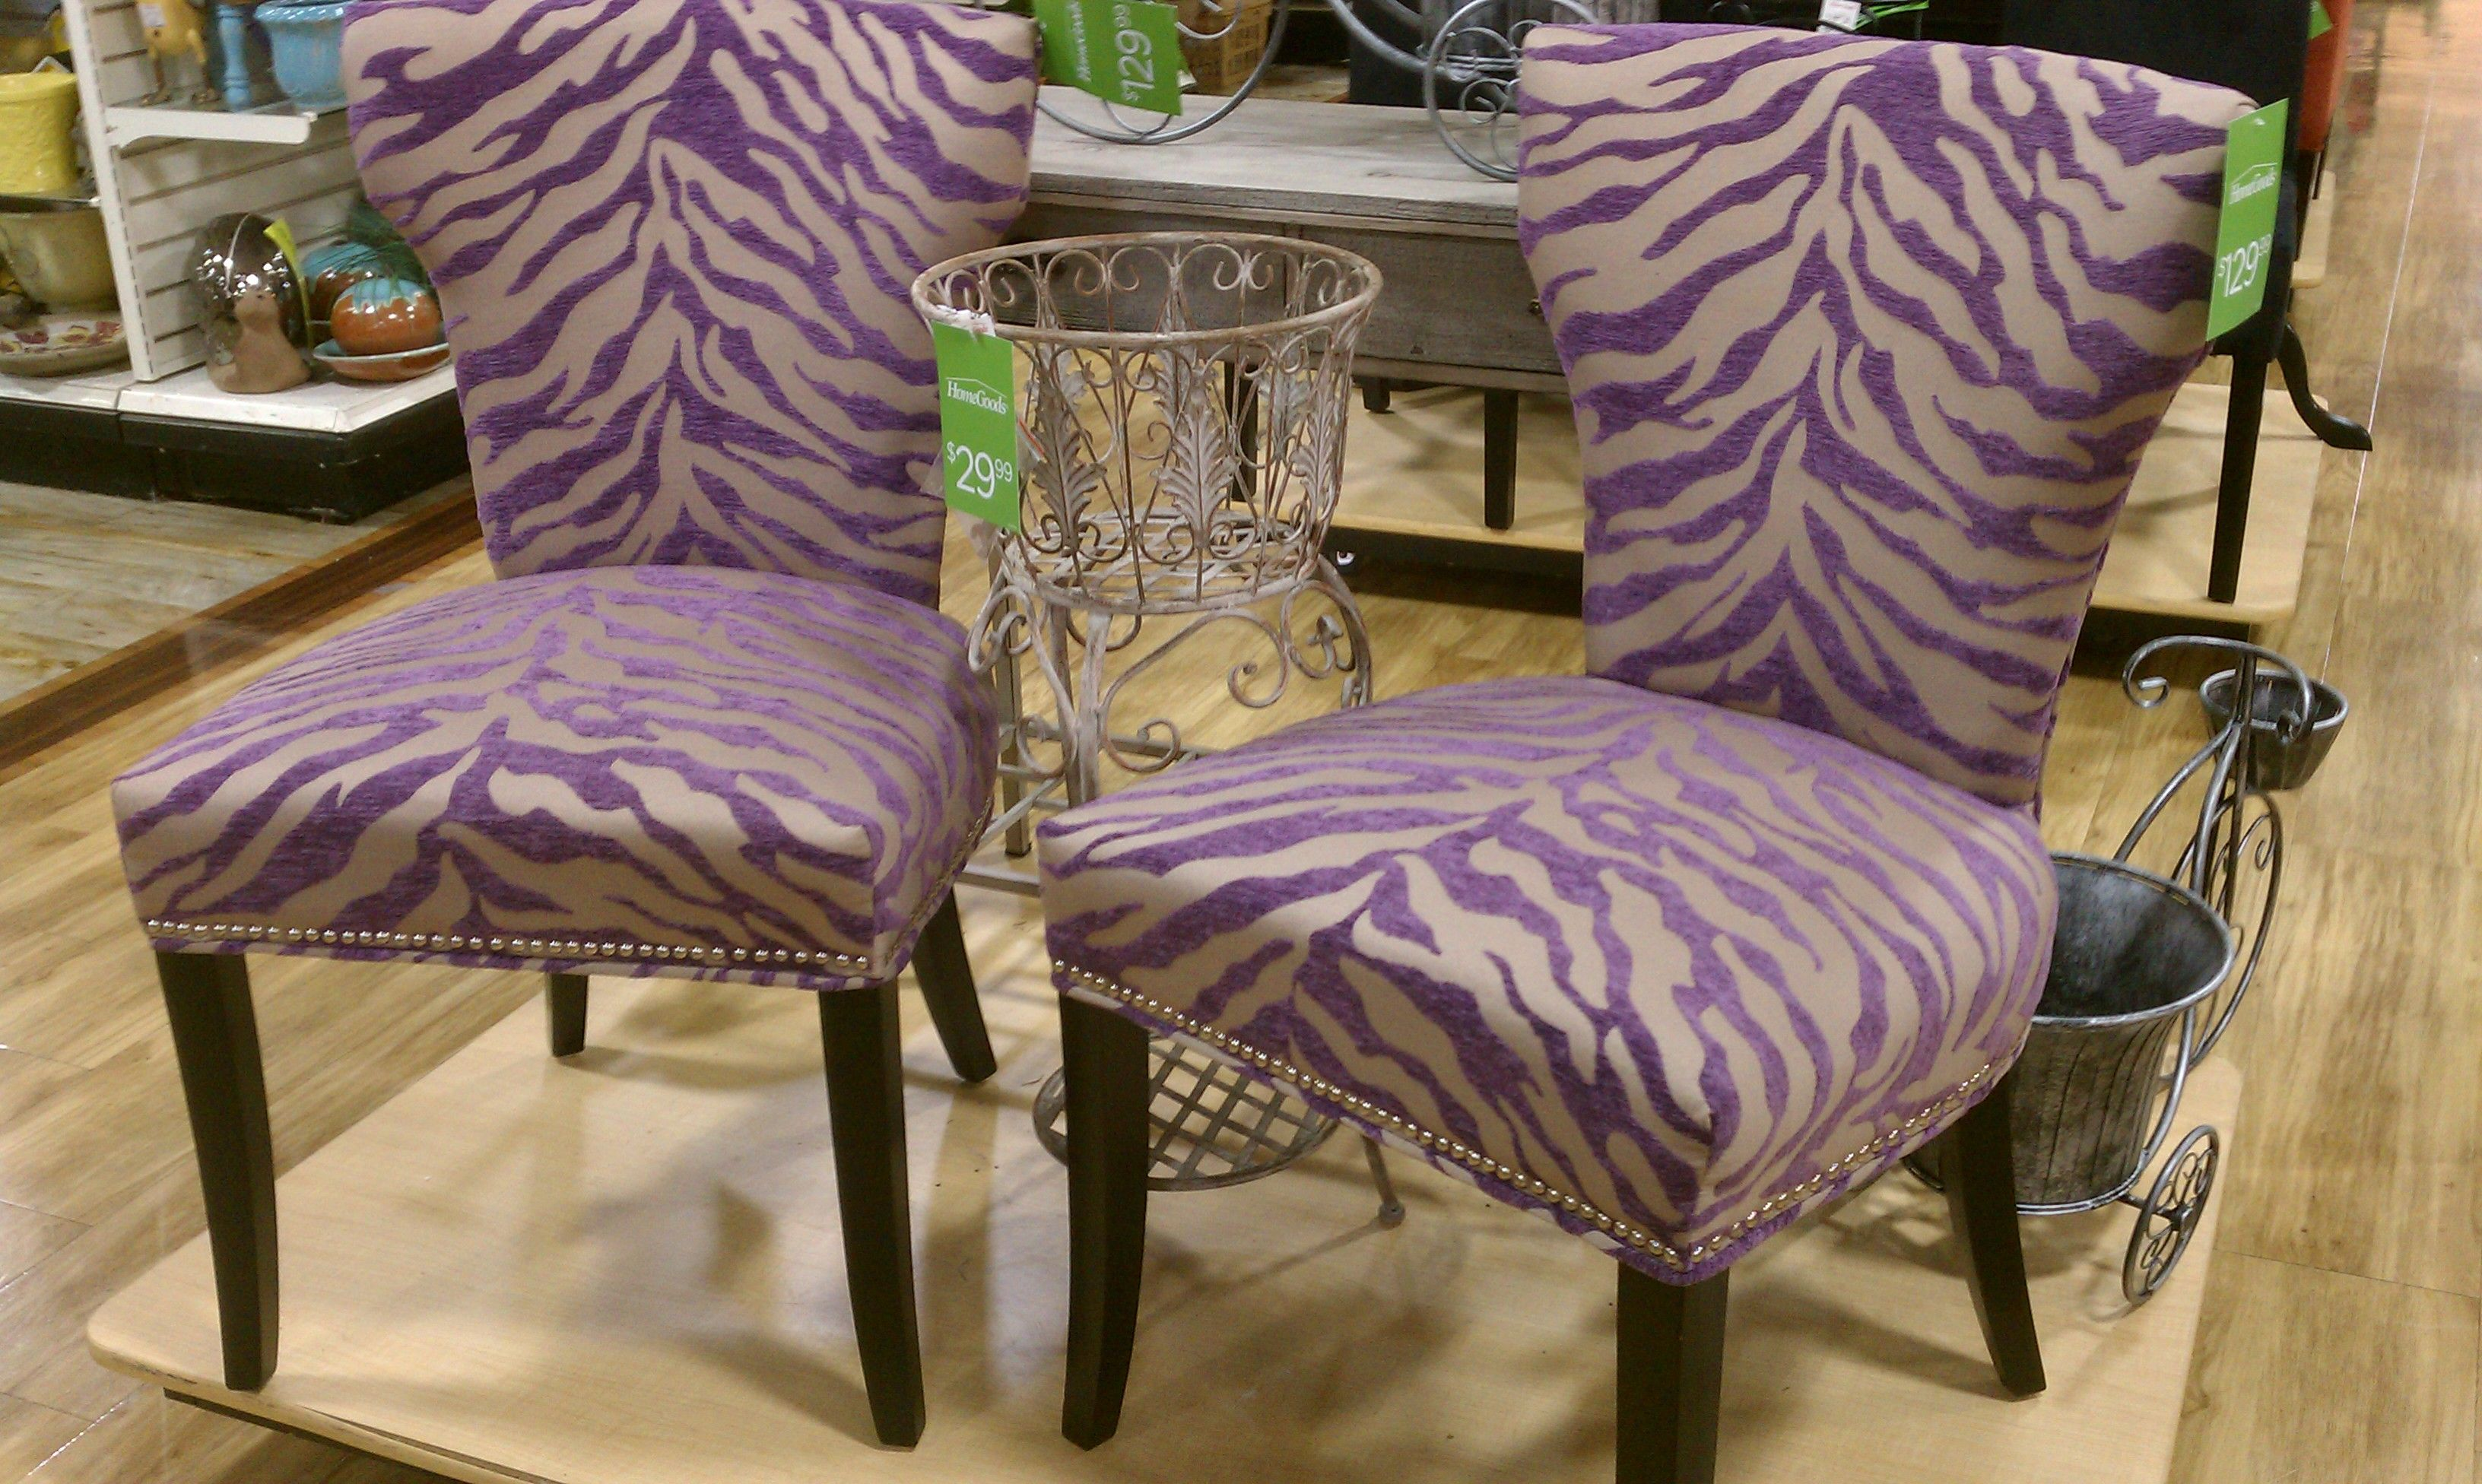 Zebra Print Chairs Funky Chairs Home Chair